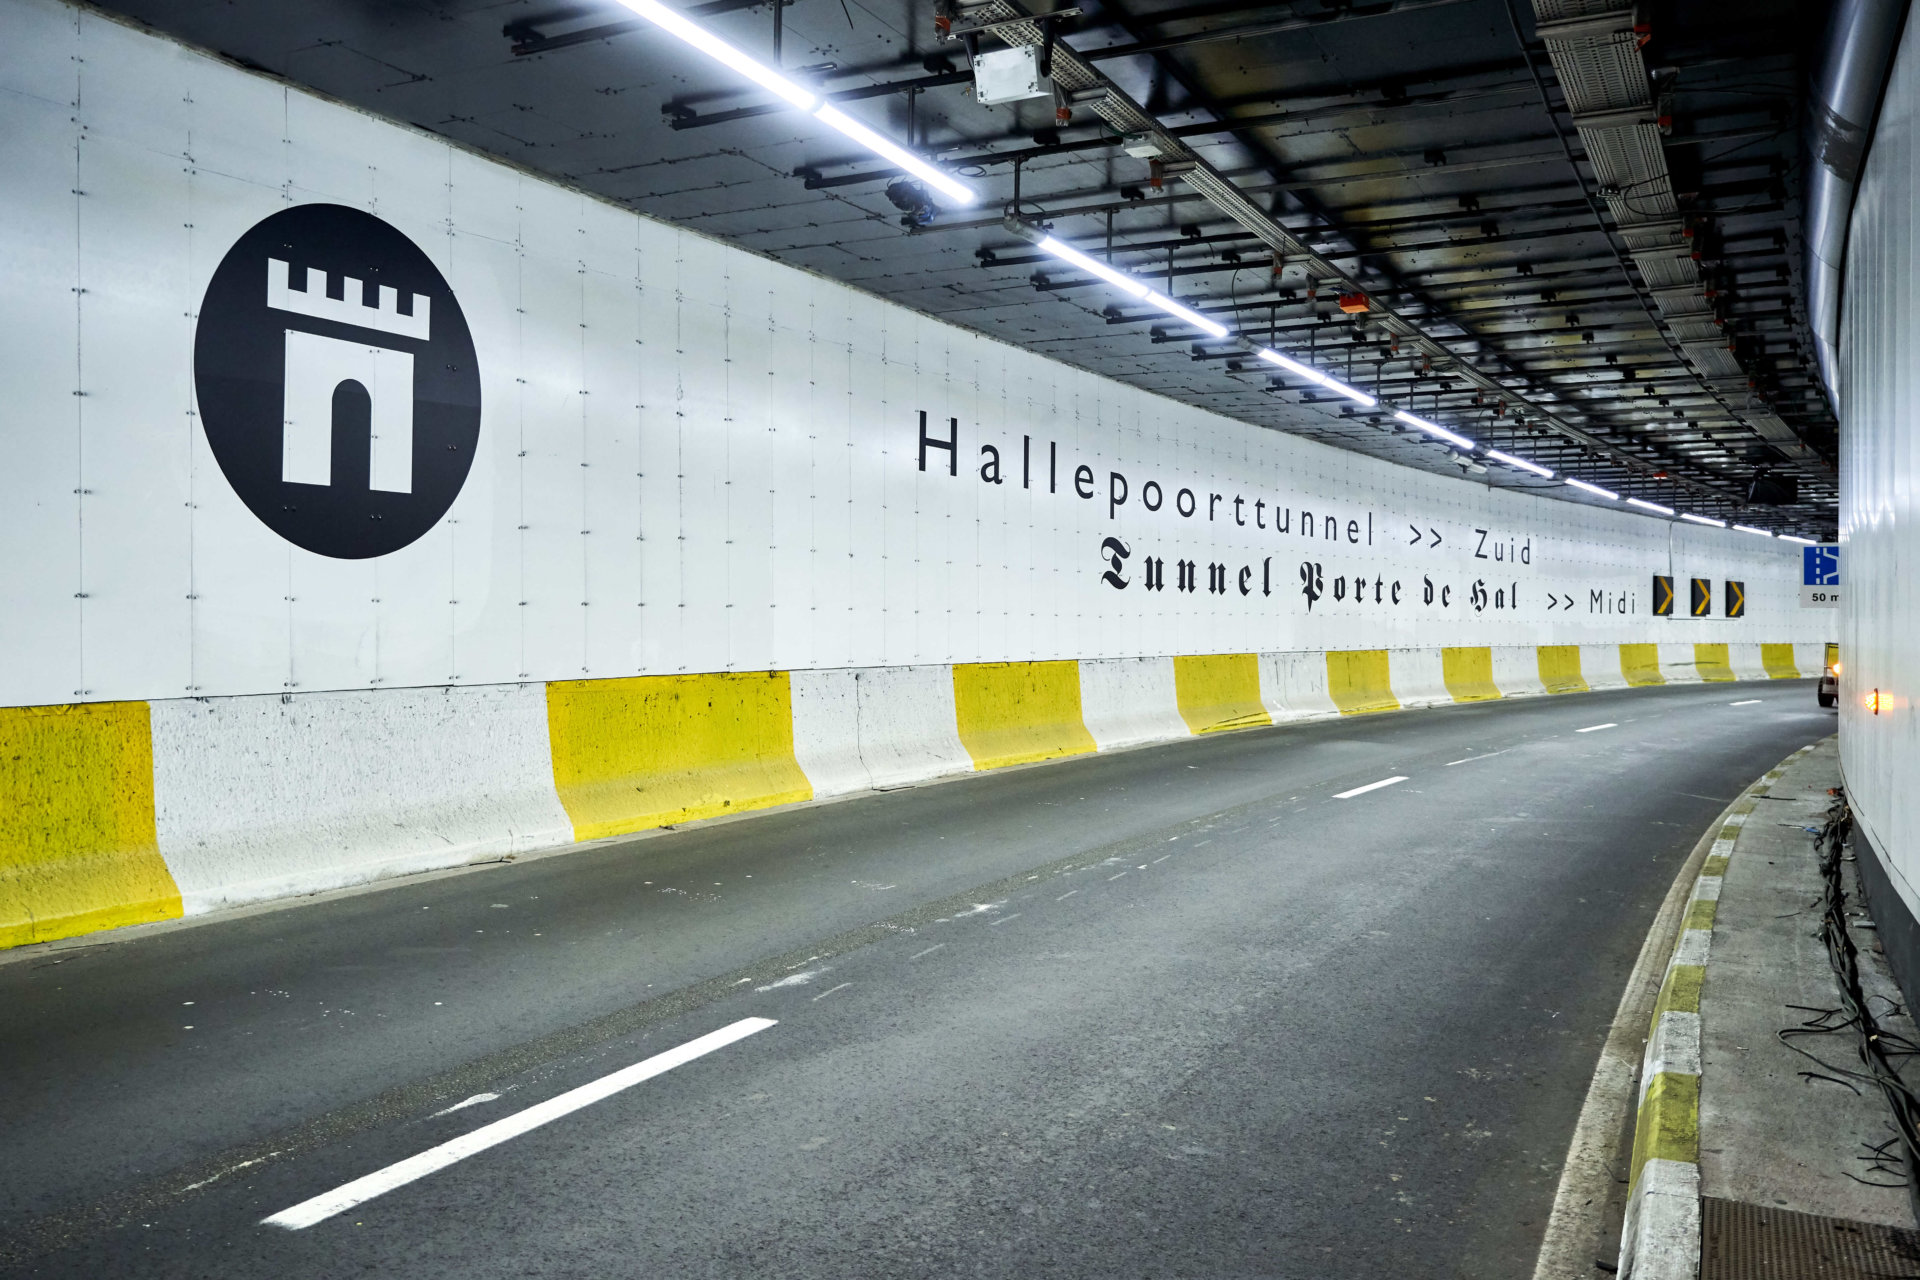 Tunnel porte de Hal 6